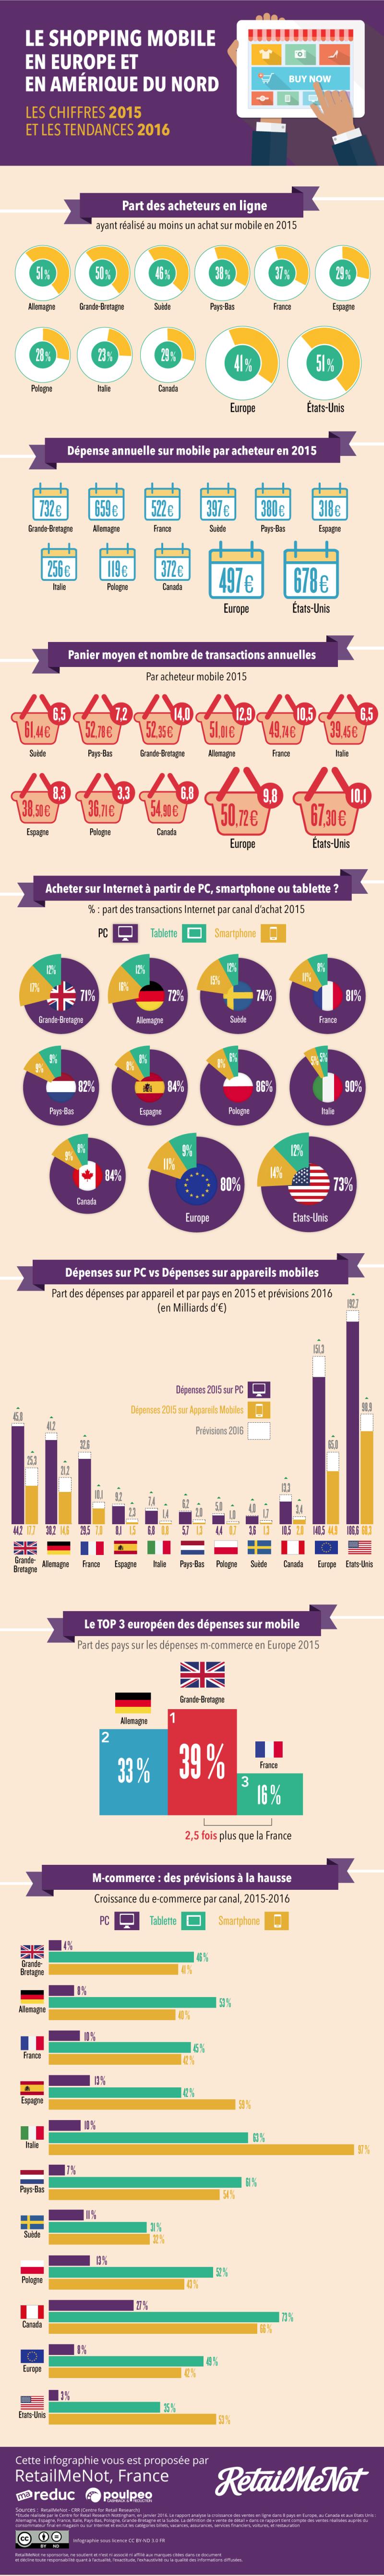 La progression du shopping mobile en europe